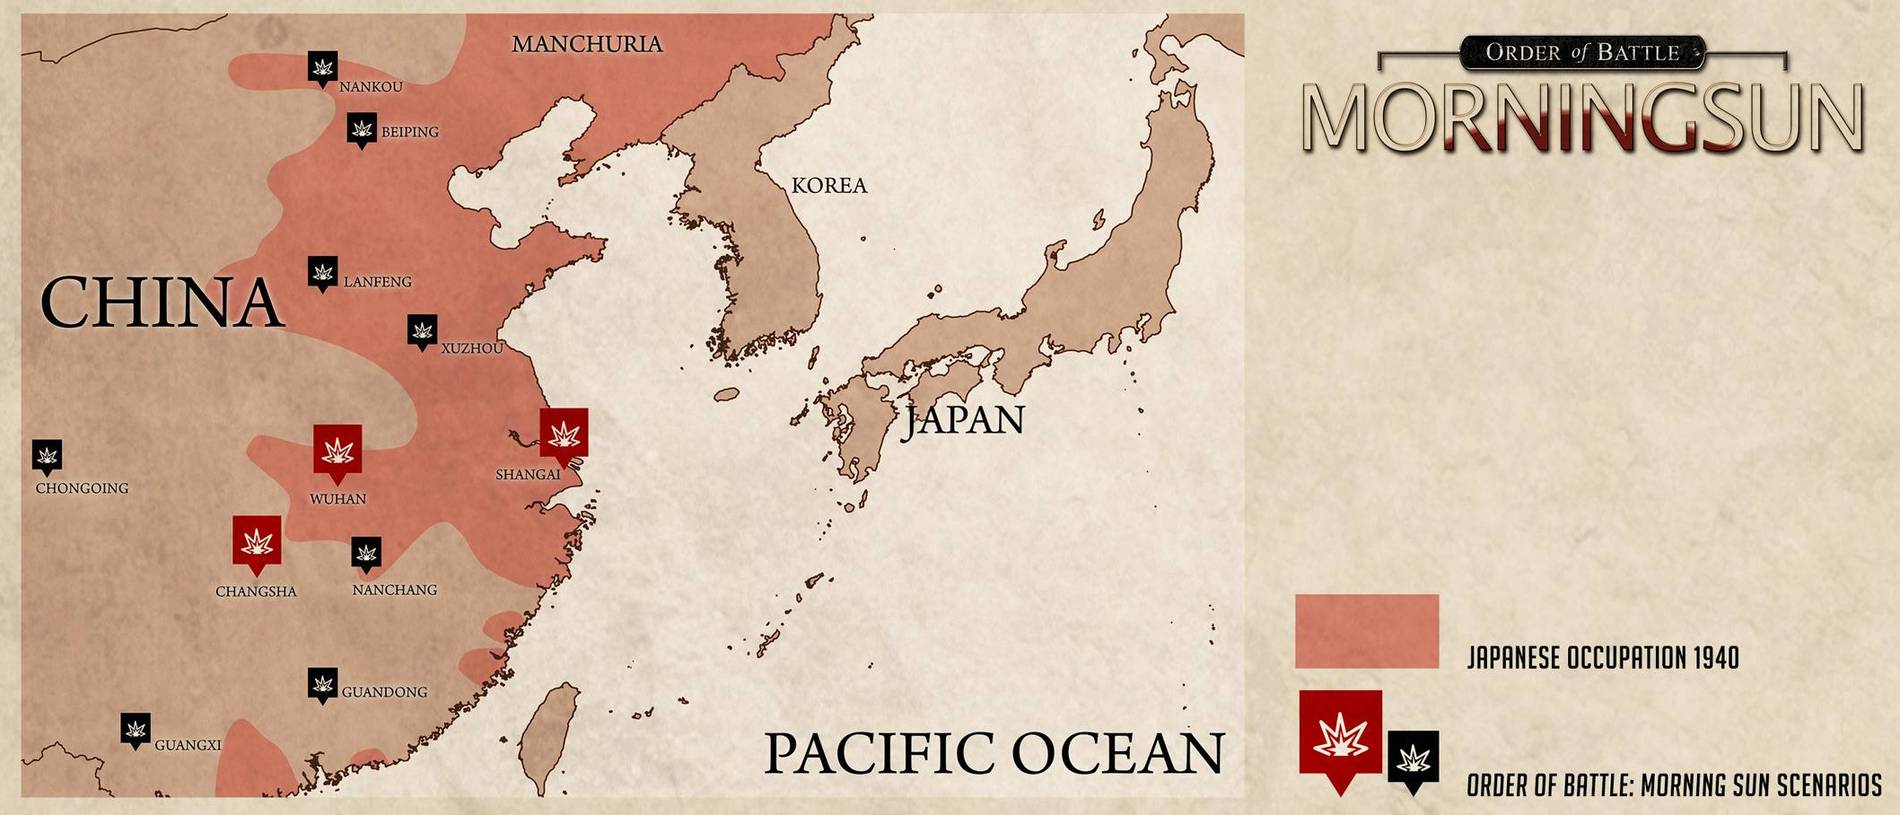 Order of Battle Morning Sun - карта исторических сценариев